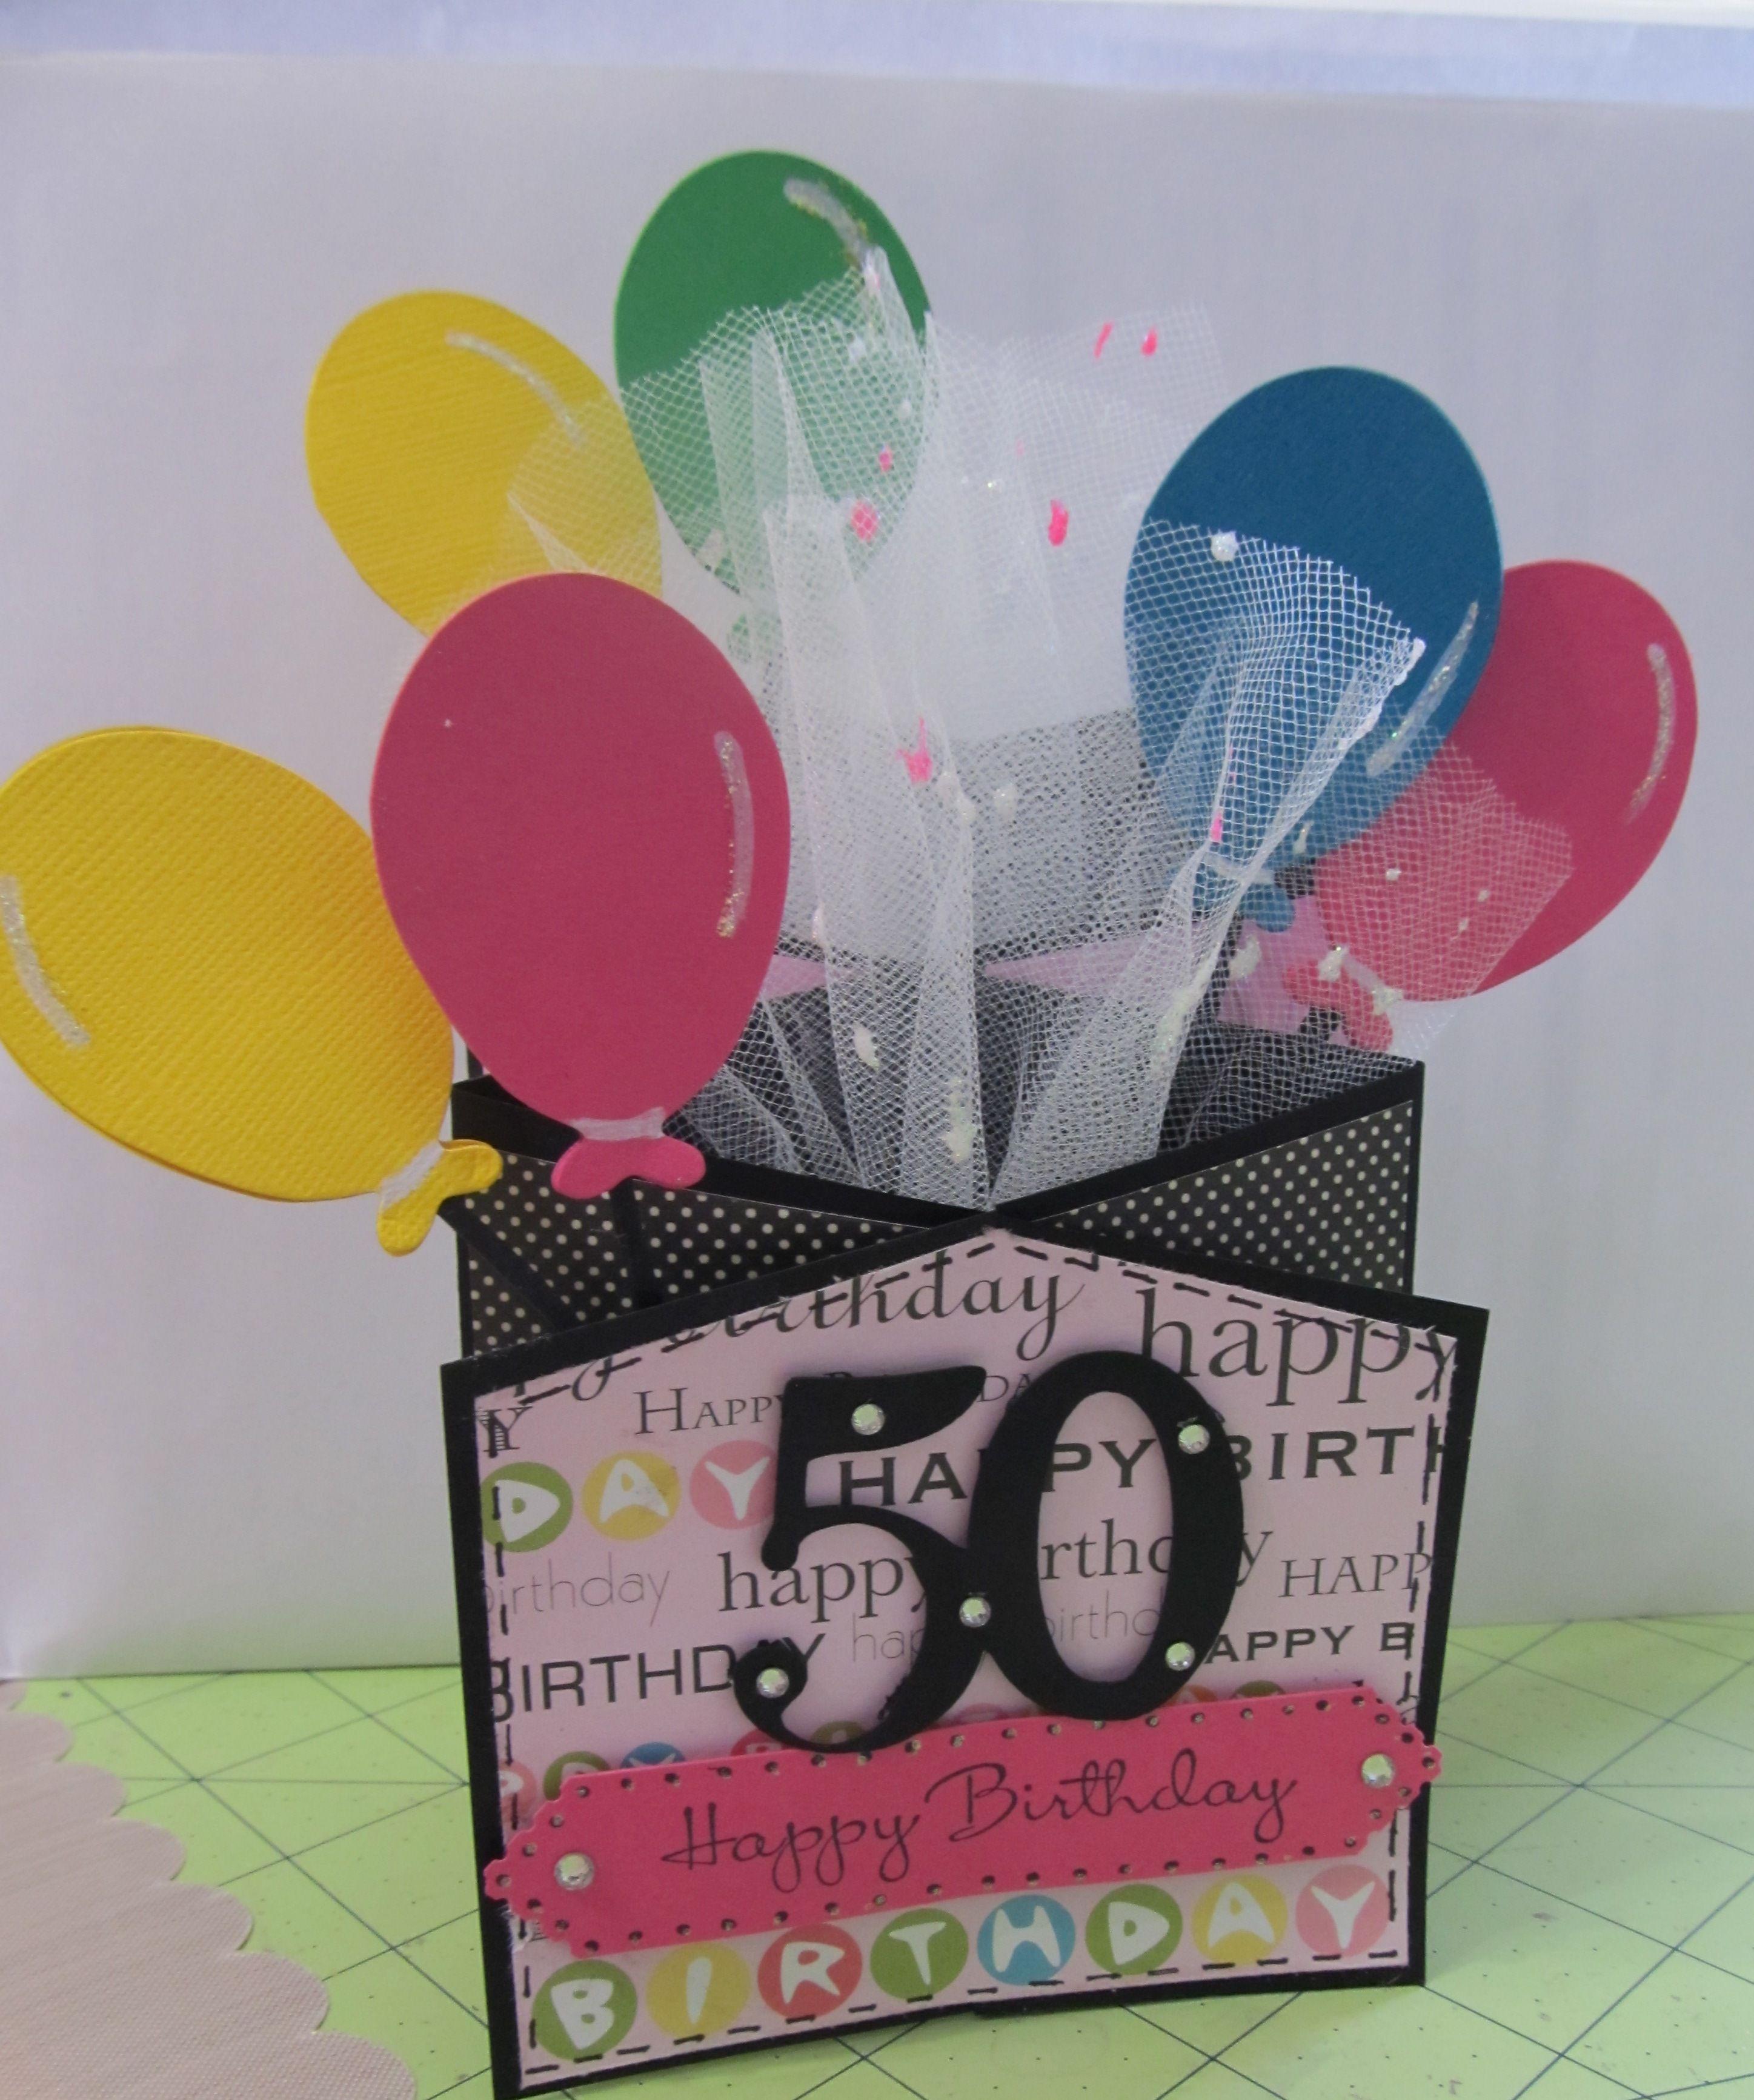 50th Birthday Card Birthday cards, 50th birthday cards